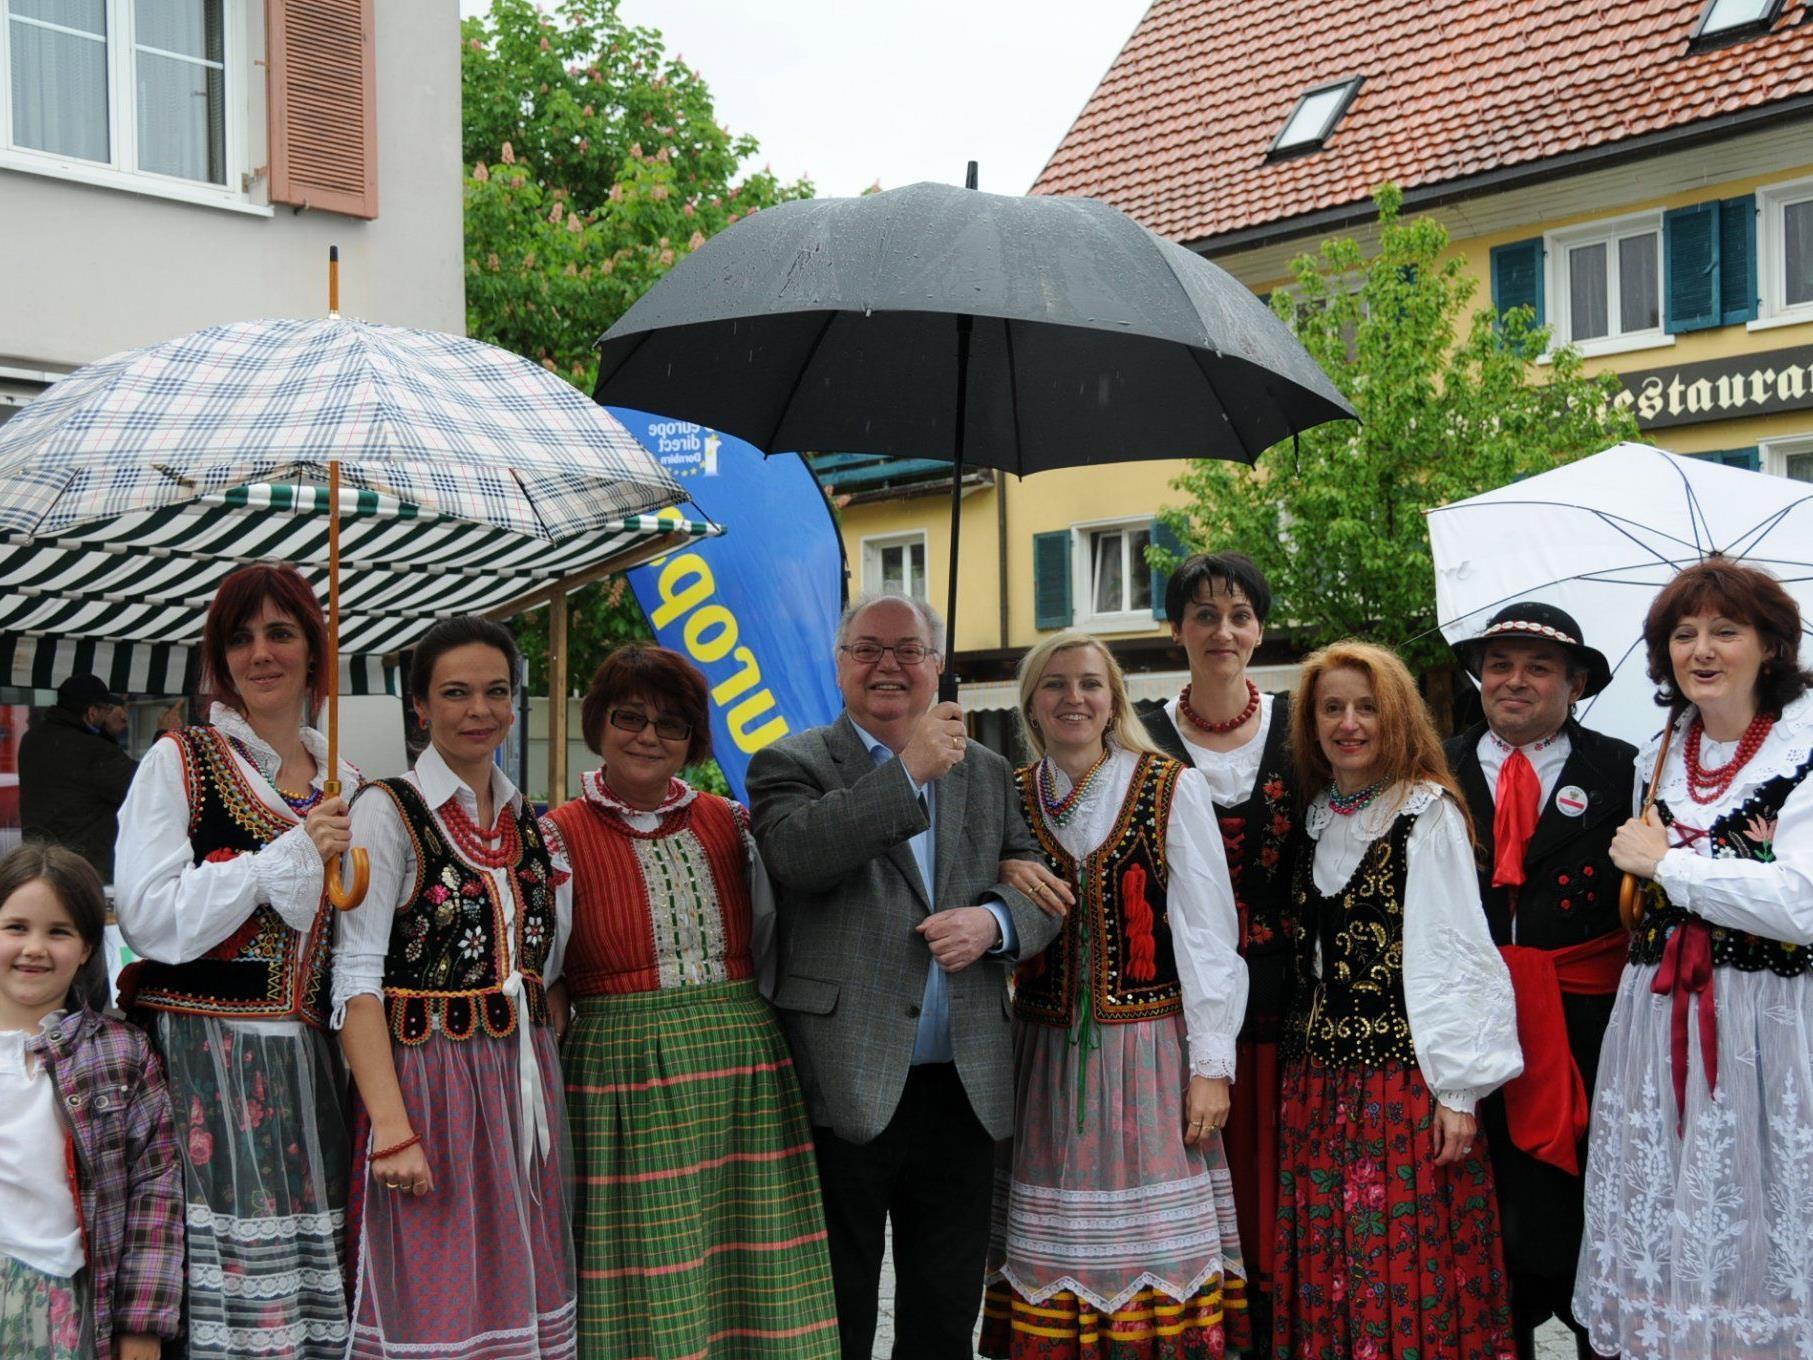 Bürgermeister Wolfgang Rümmele zwischen polnischen Trachtenträgerinnen